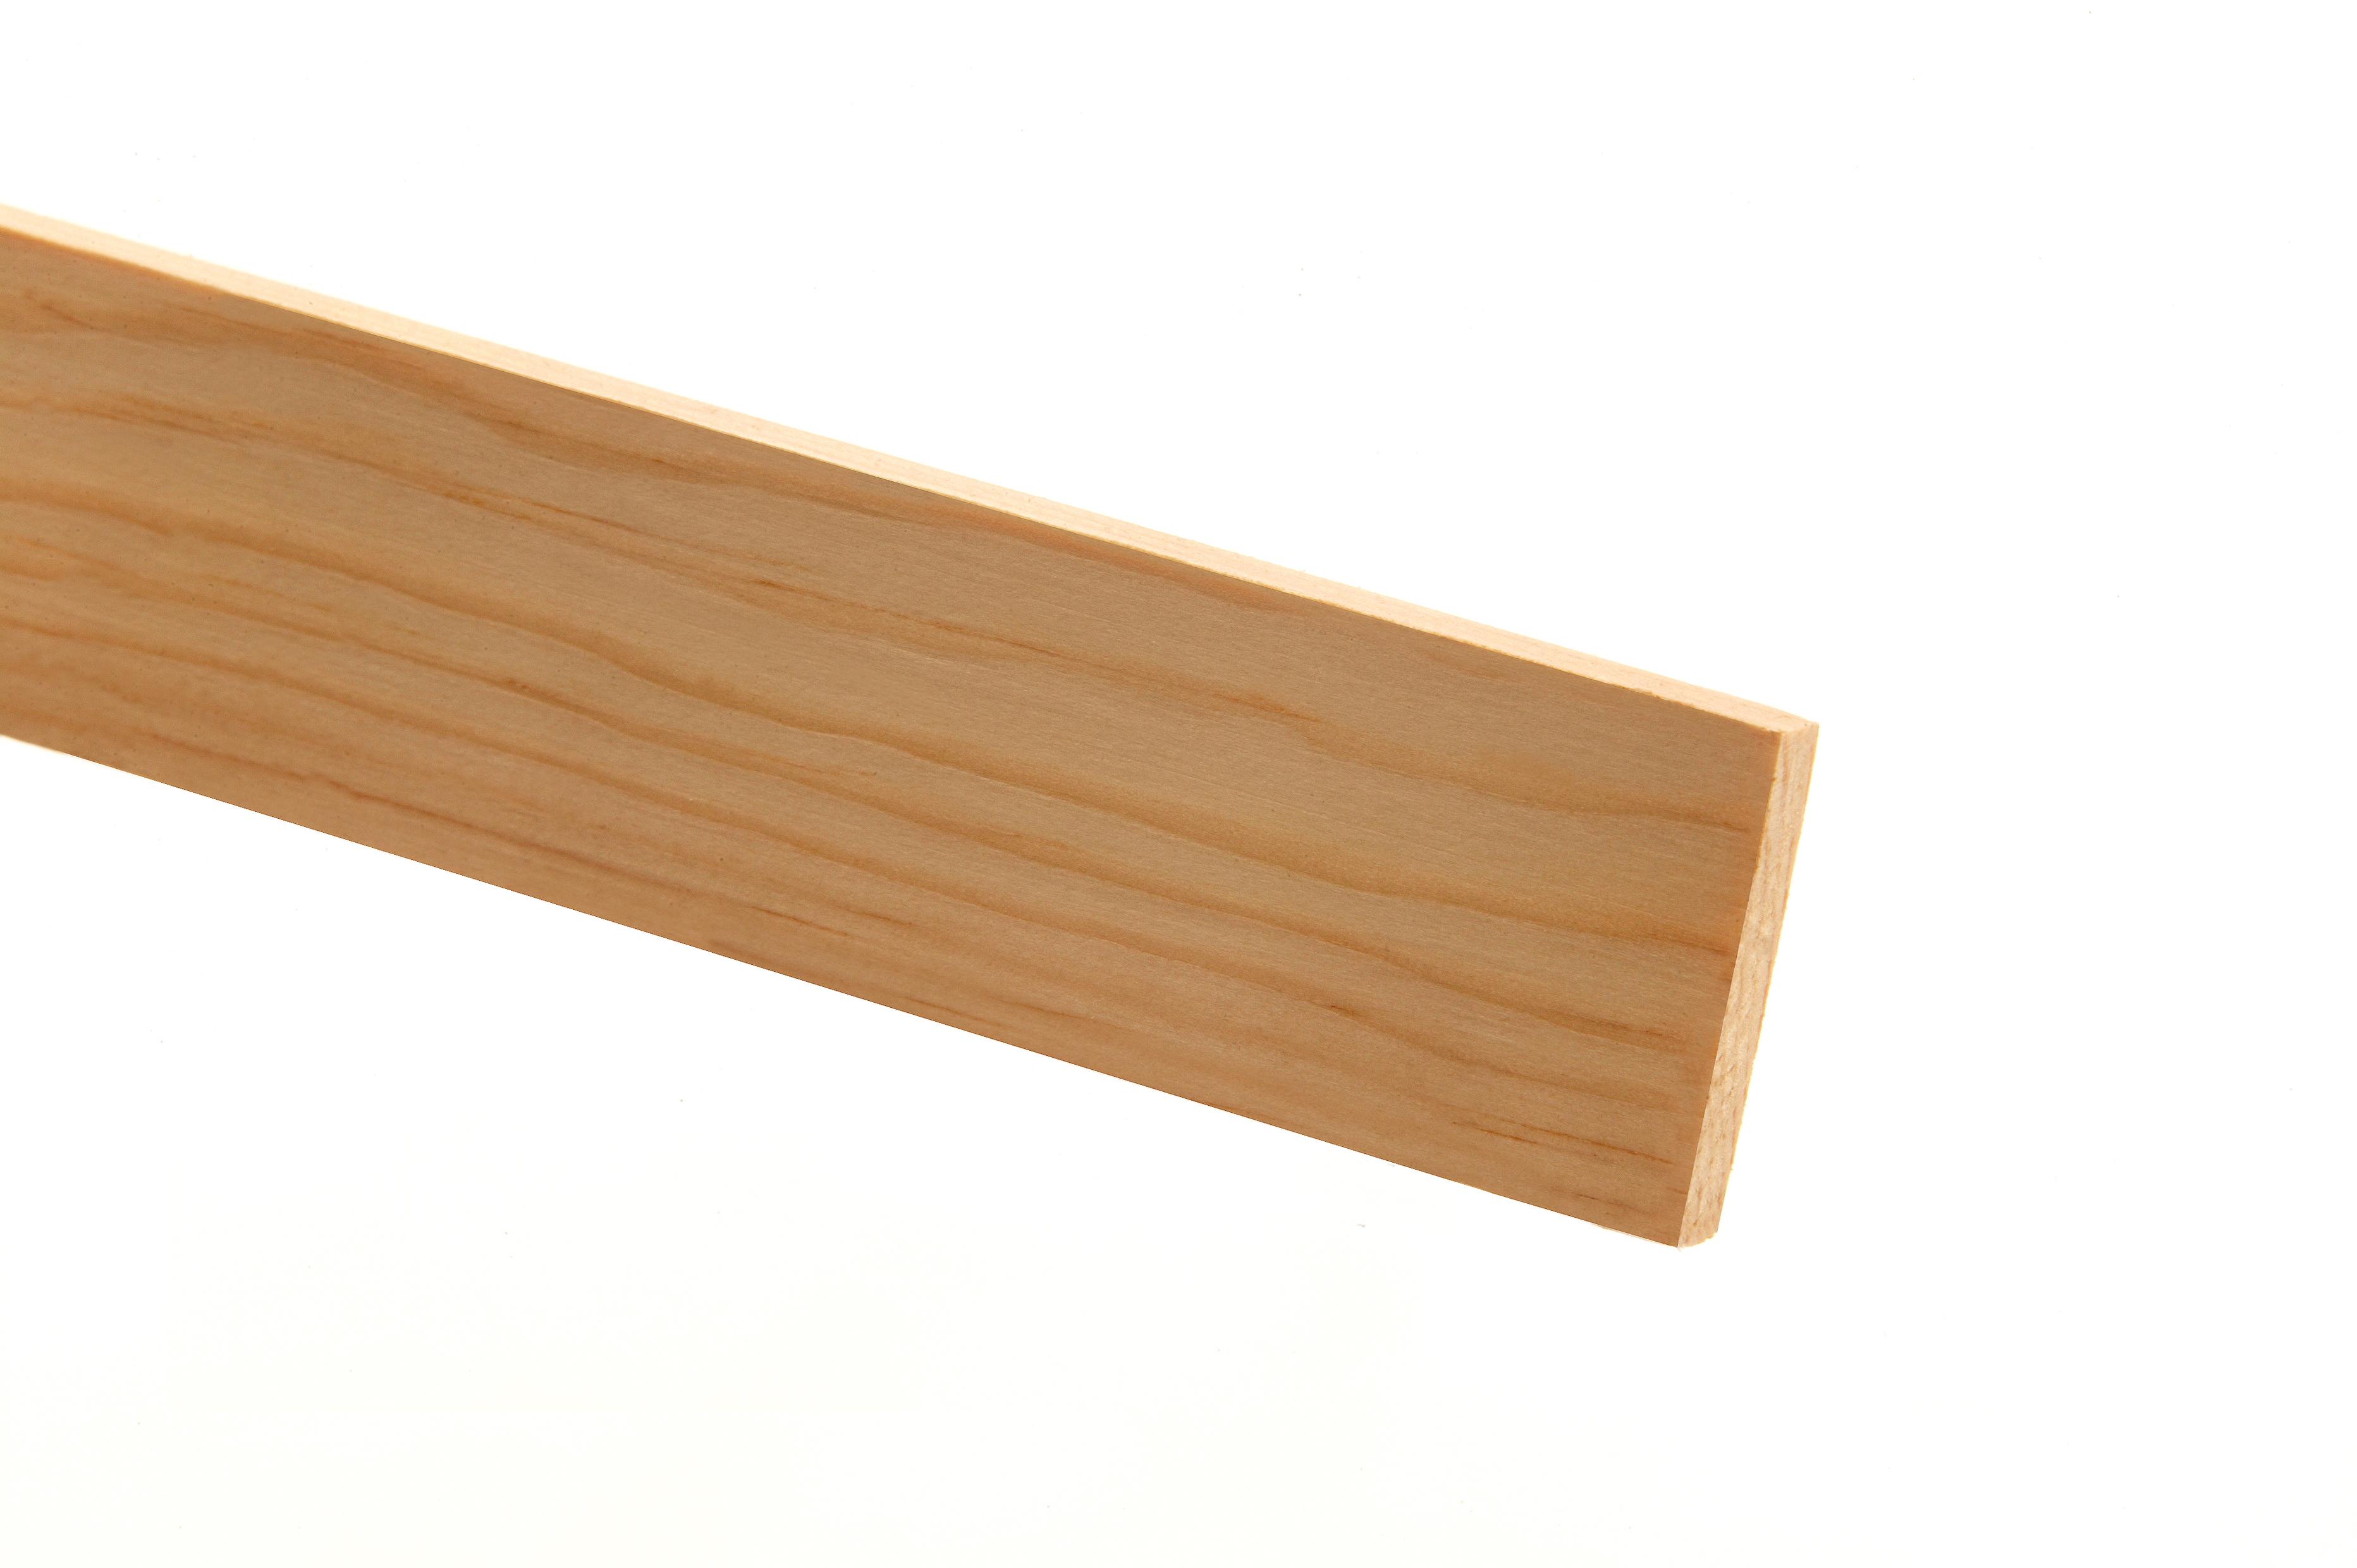 20 Pine PSE Stripwood 4 x 21 x 2400mm